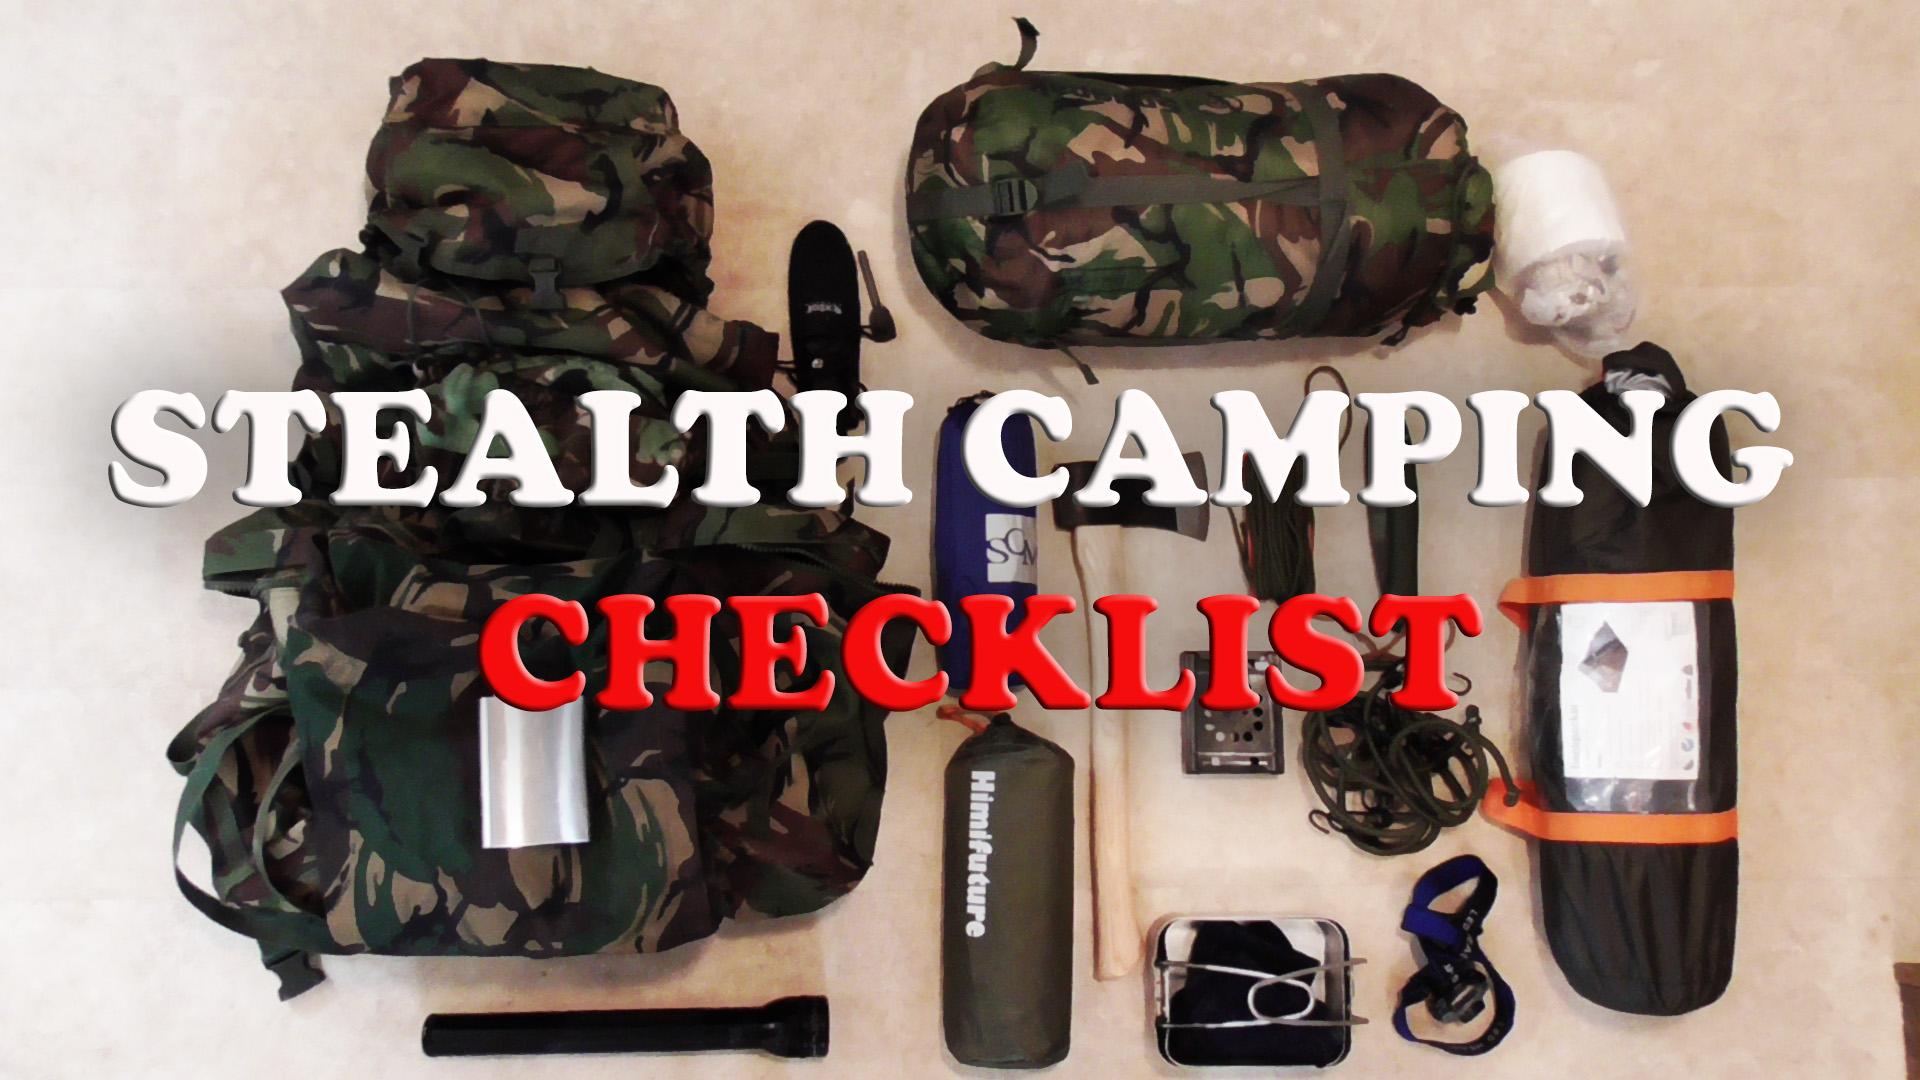 stealth camping checklist